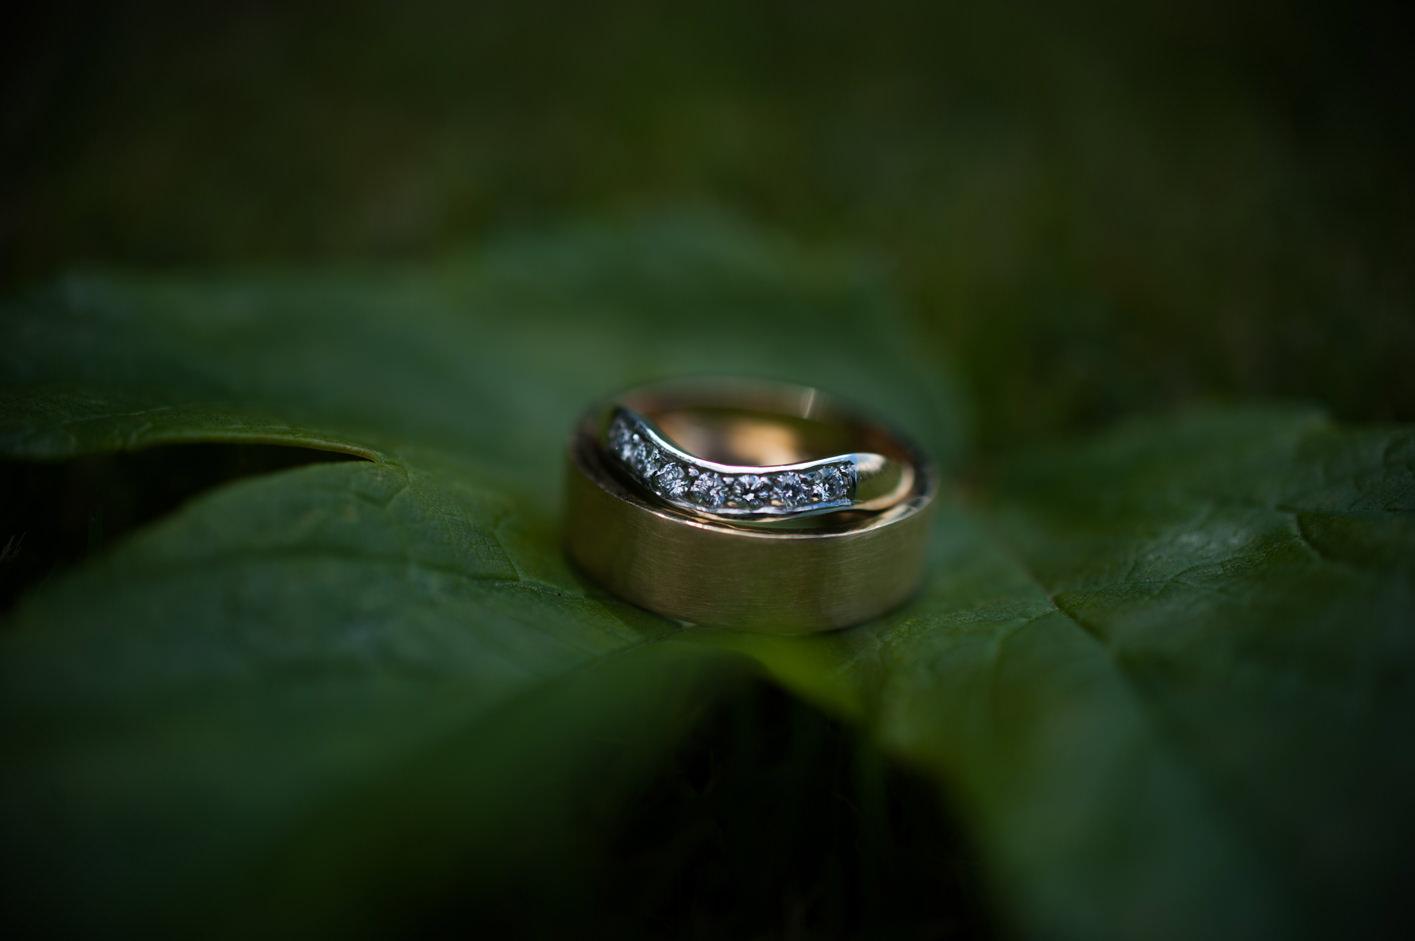 creative-wedding-photography-scottish-highlands.jpg